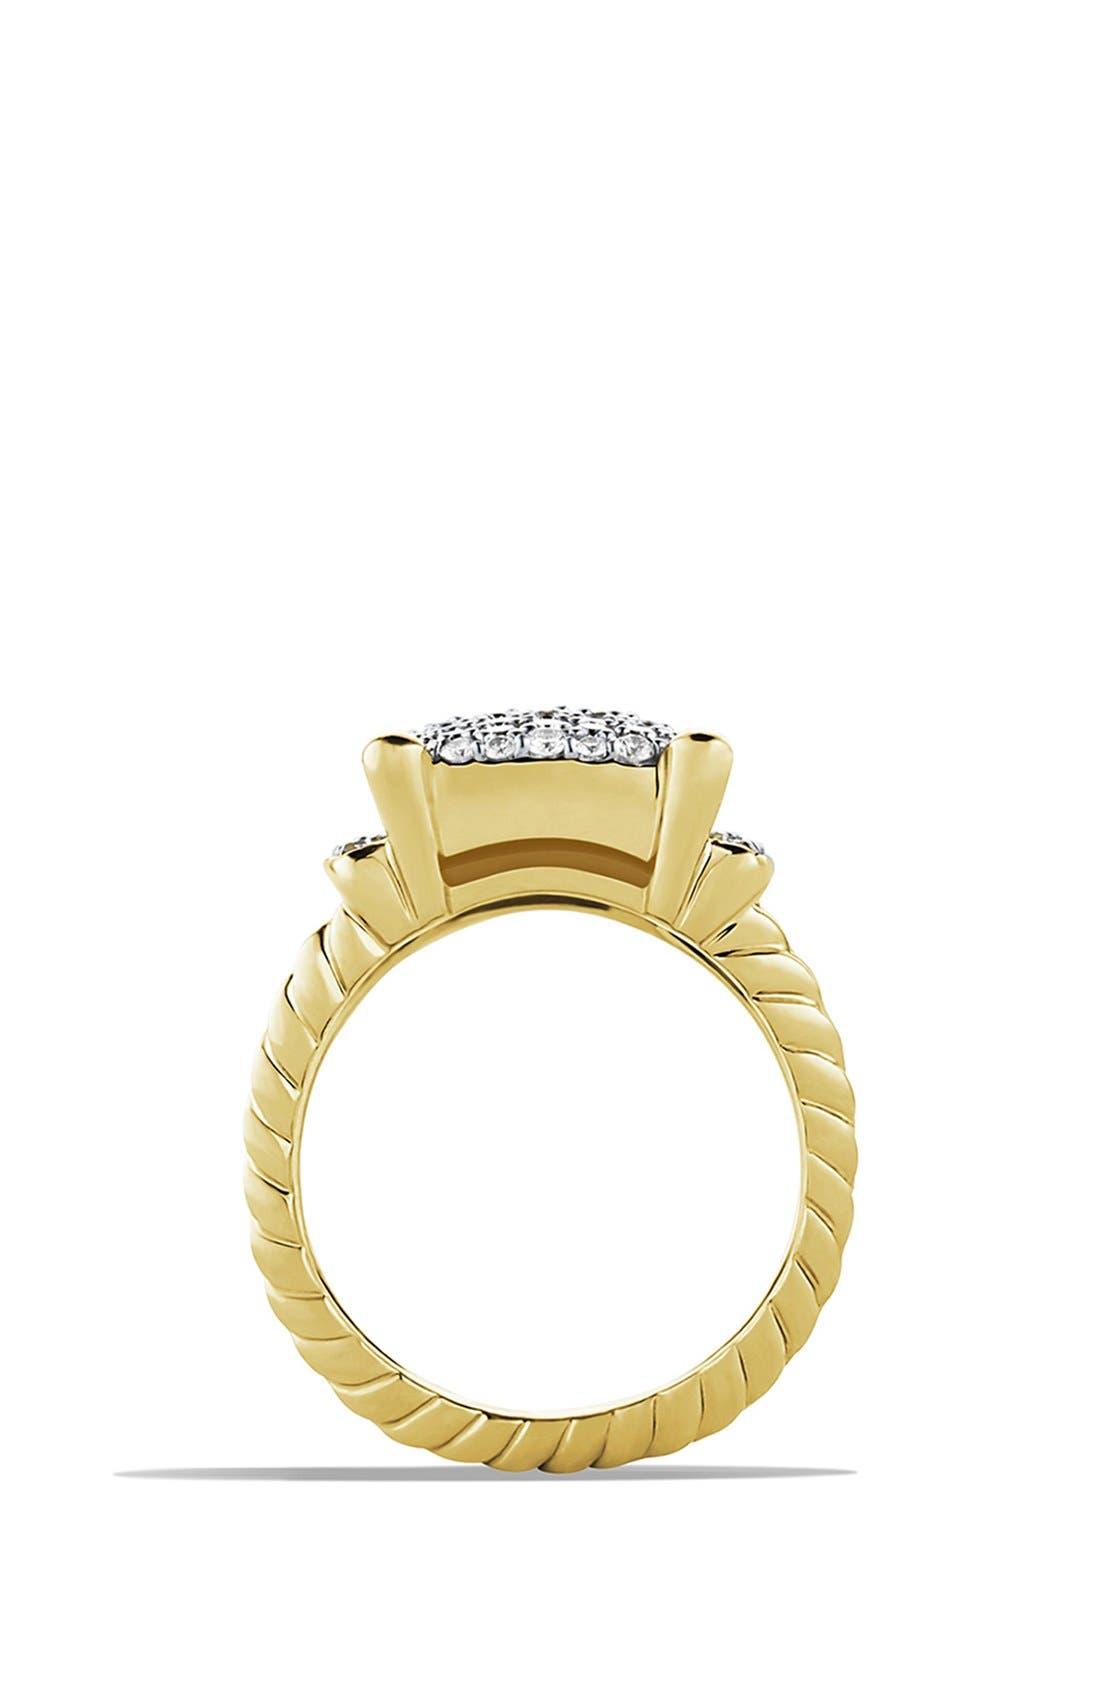 'Wheaton' Ring with Diamonds in Gold,                             Alternate thumbnail 4, color,                             Diamond